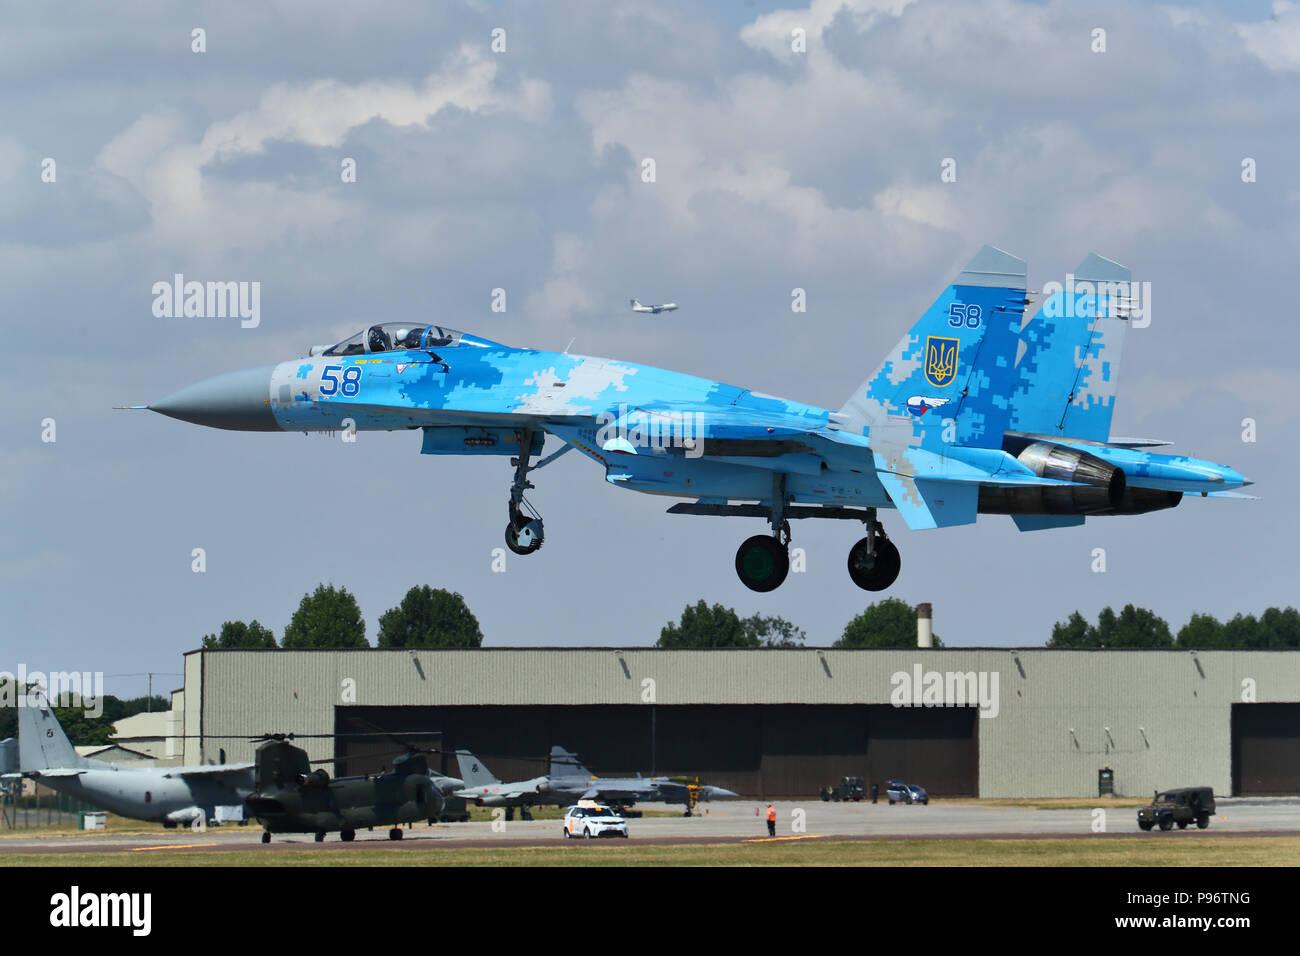 A Ukrainian Sukhoi SU-27 Flanker landing at the Royal International Air Tattoo 2018 at RAF Fairford, UK - Stock Image